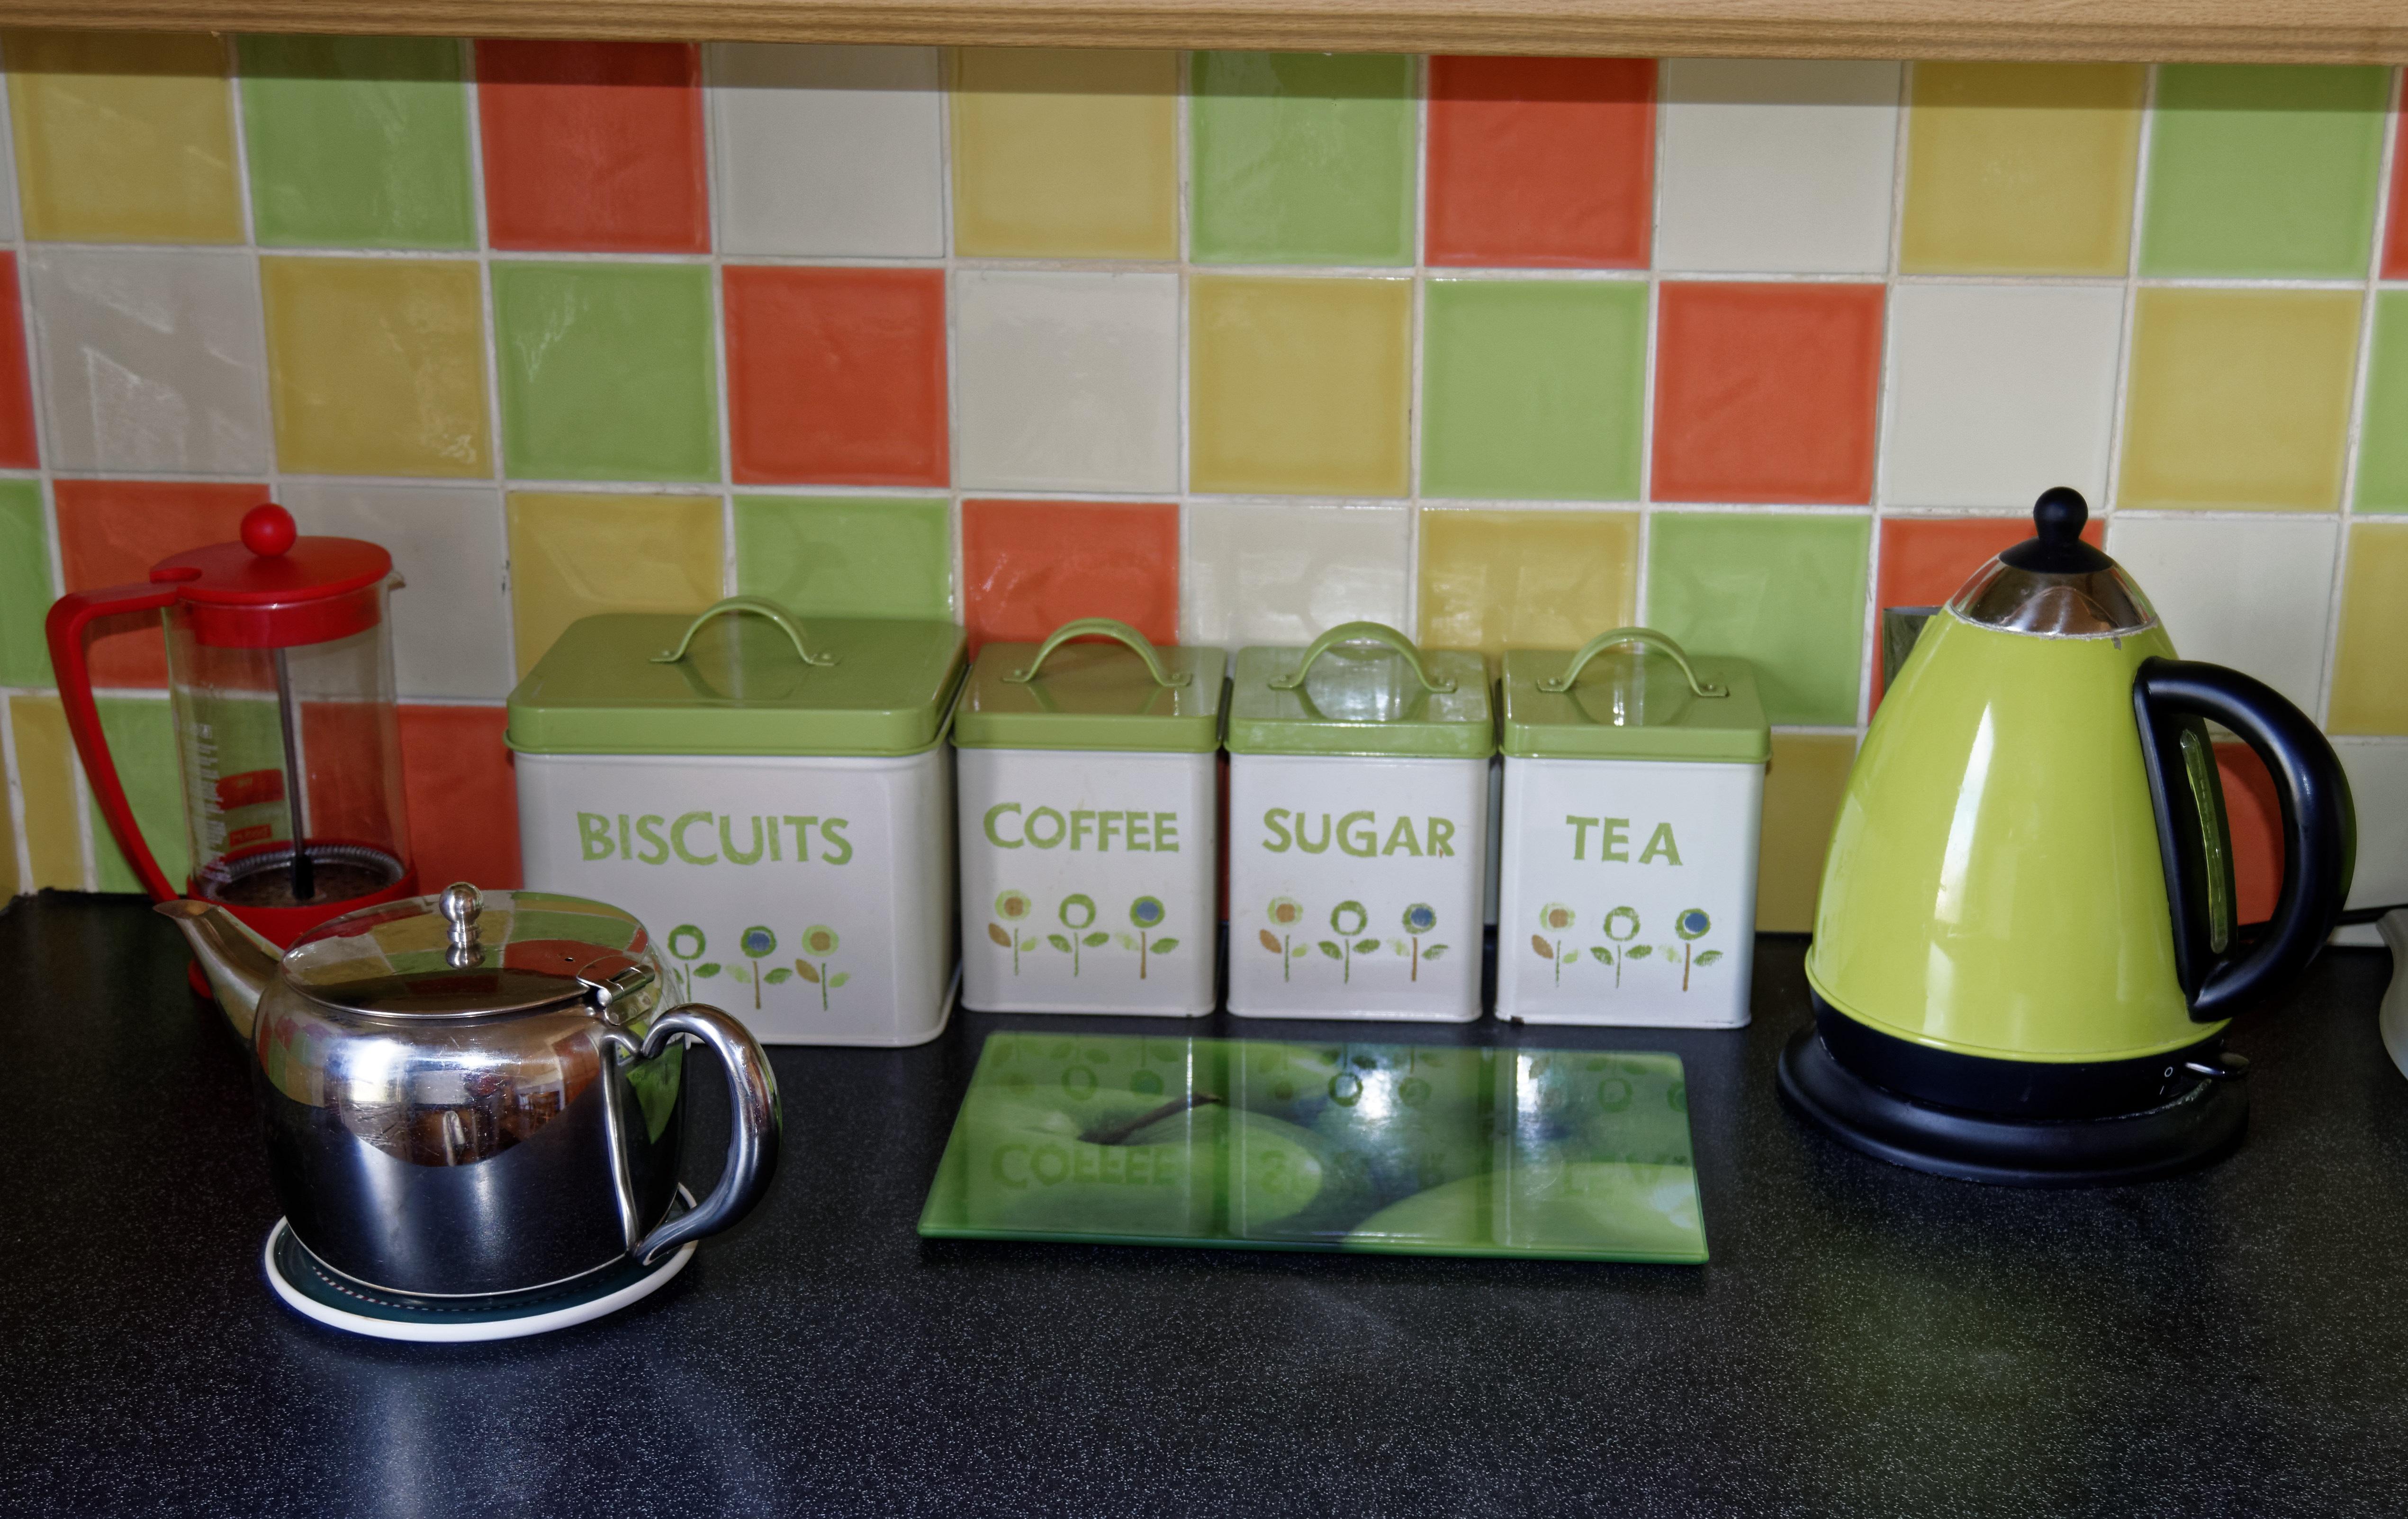 Gambar Kopi Teh Kaca Hijau Peralatan Warna Ketel Dapur